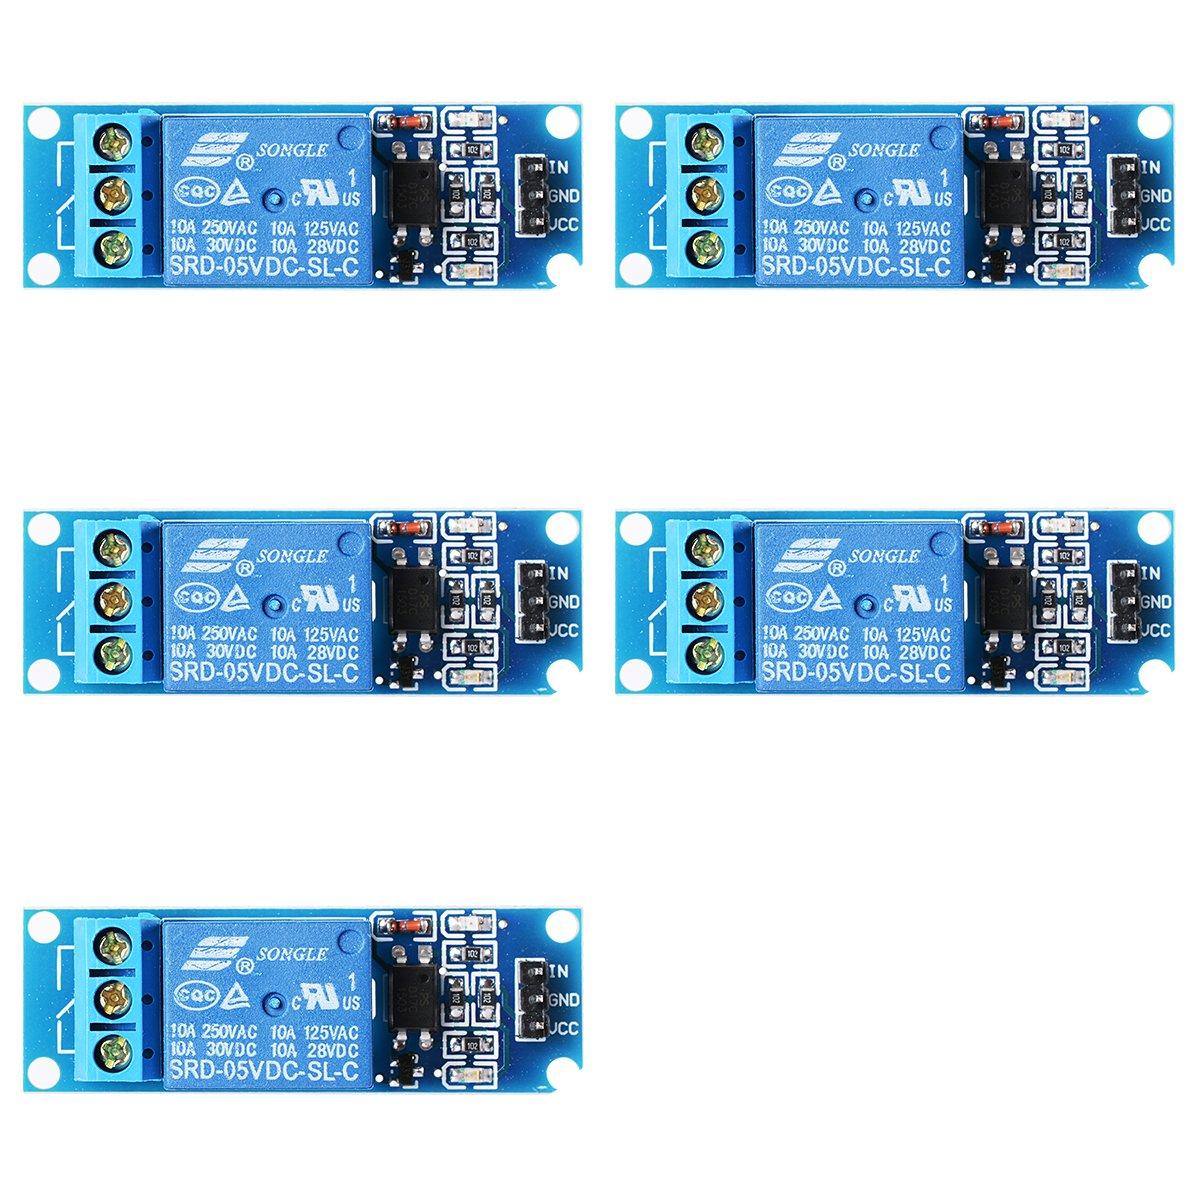 XCSOURCE 5PCS 5V/9V/12V/24V 1 Channel Relay Shield Module Optocoupler For PIC AVR DSP ARM Arduino TE213